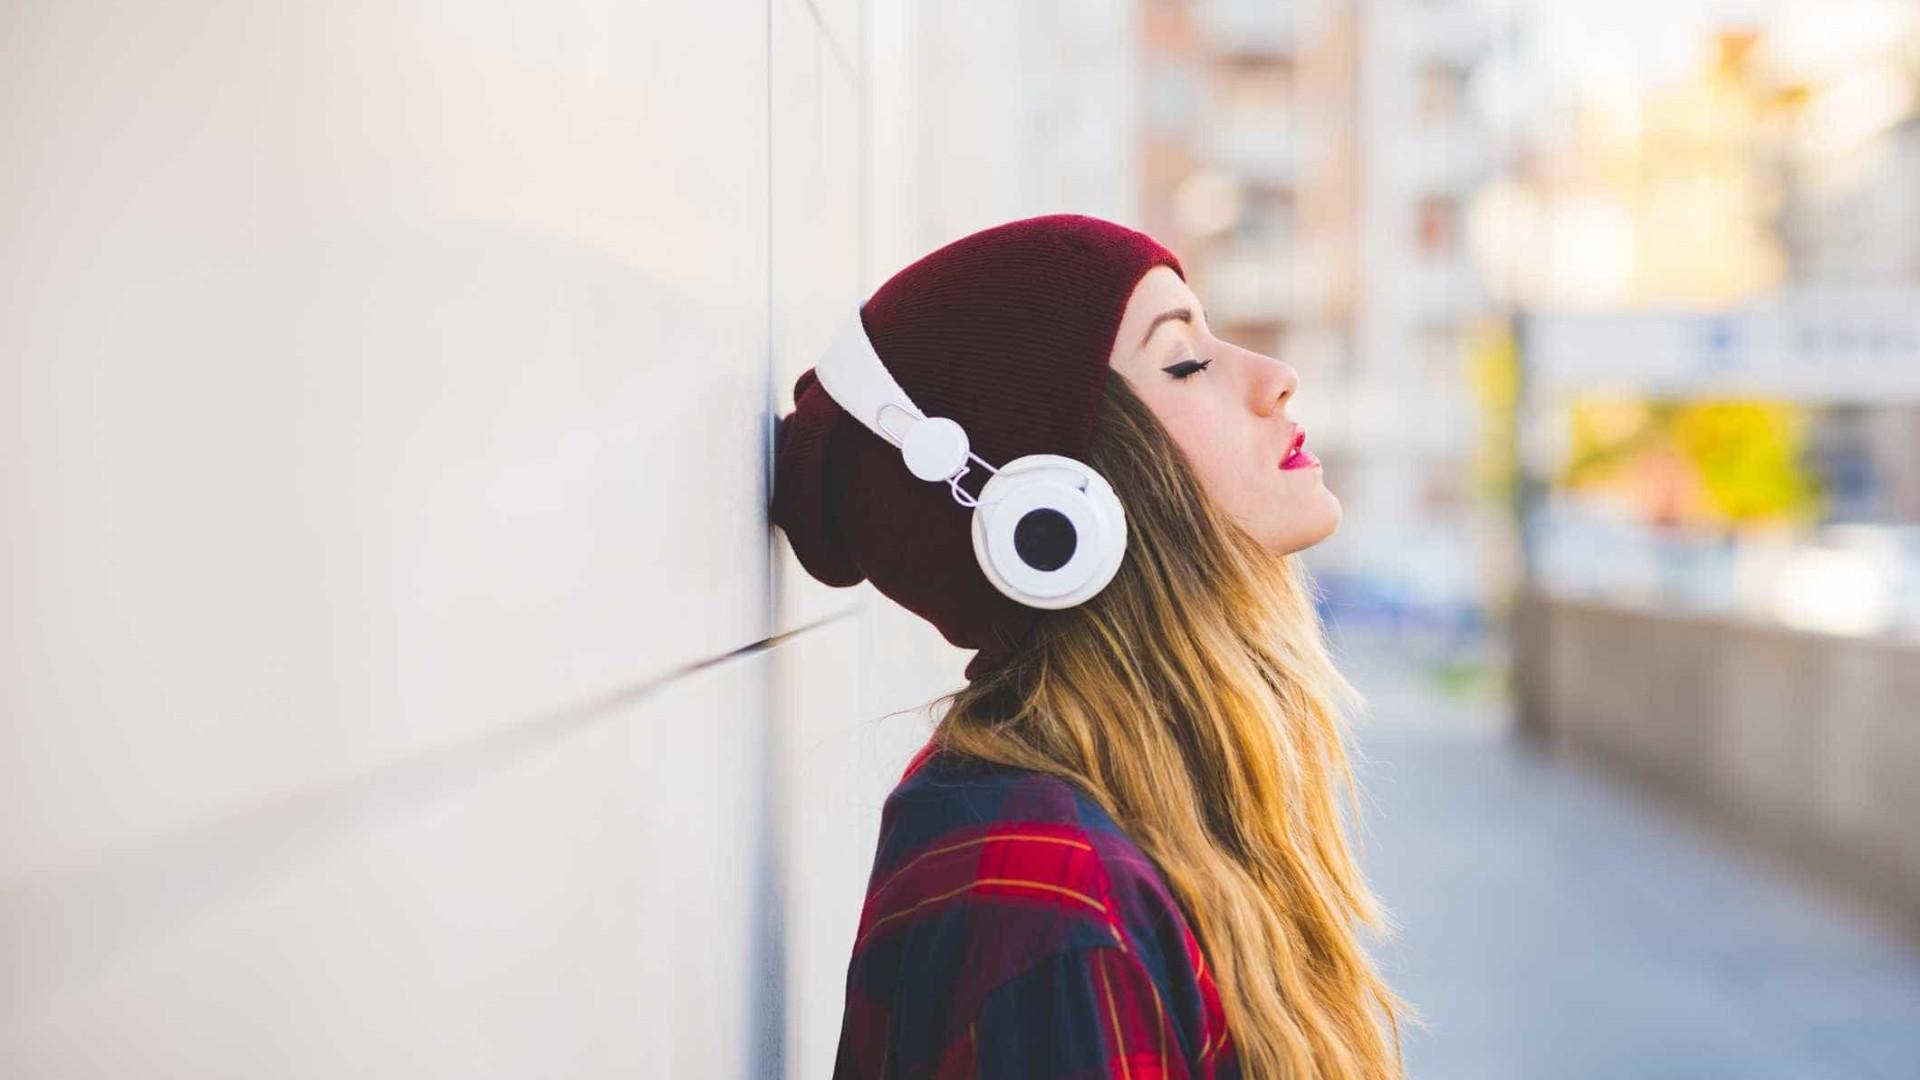 Apple Music continua a conquistar fãs